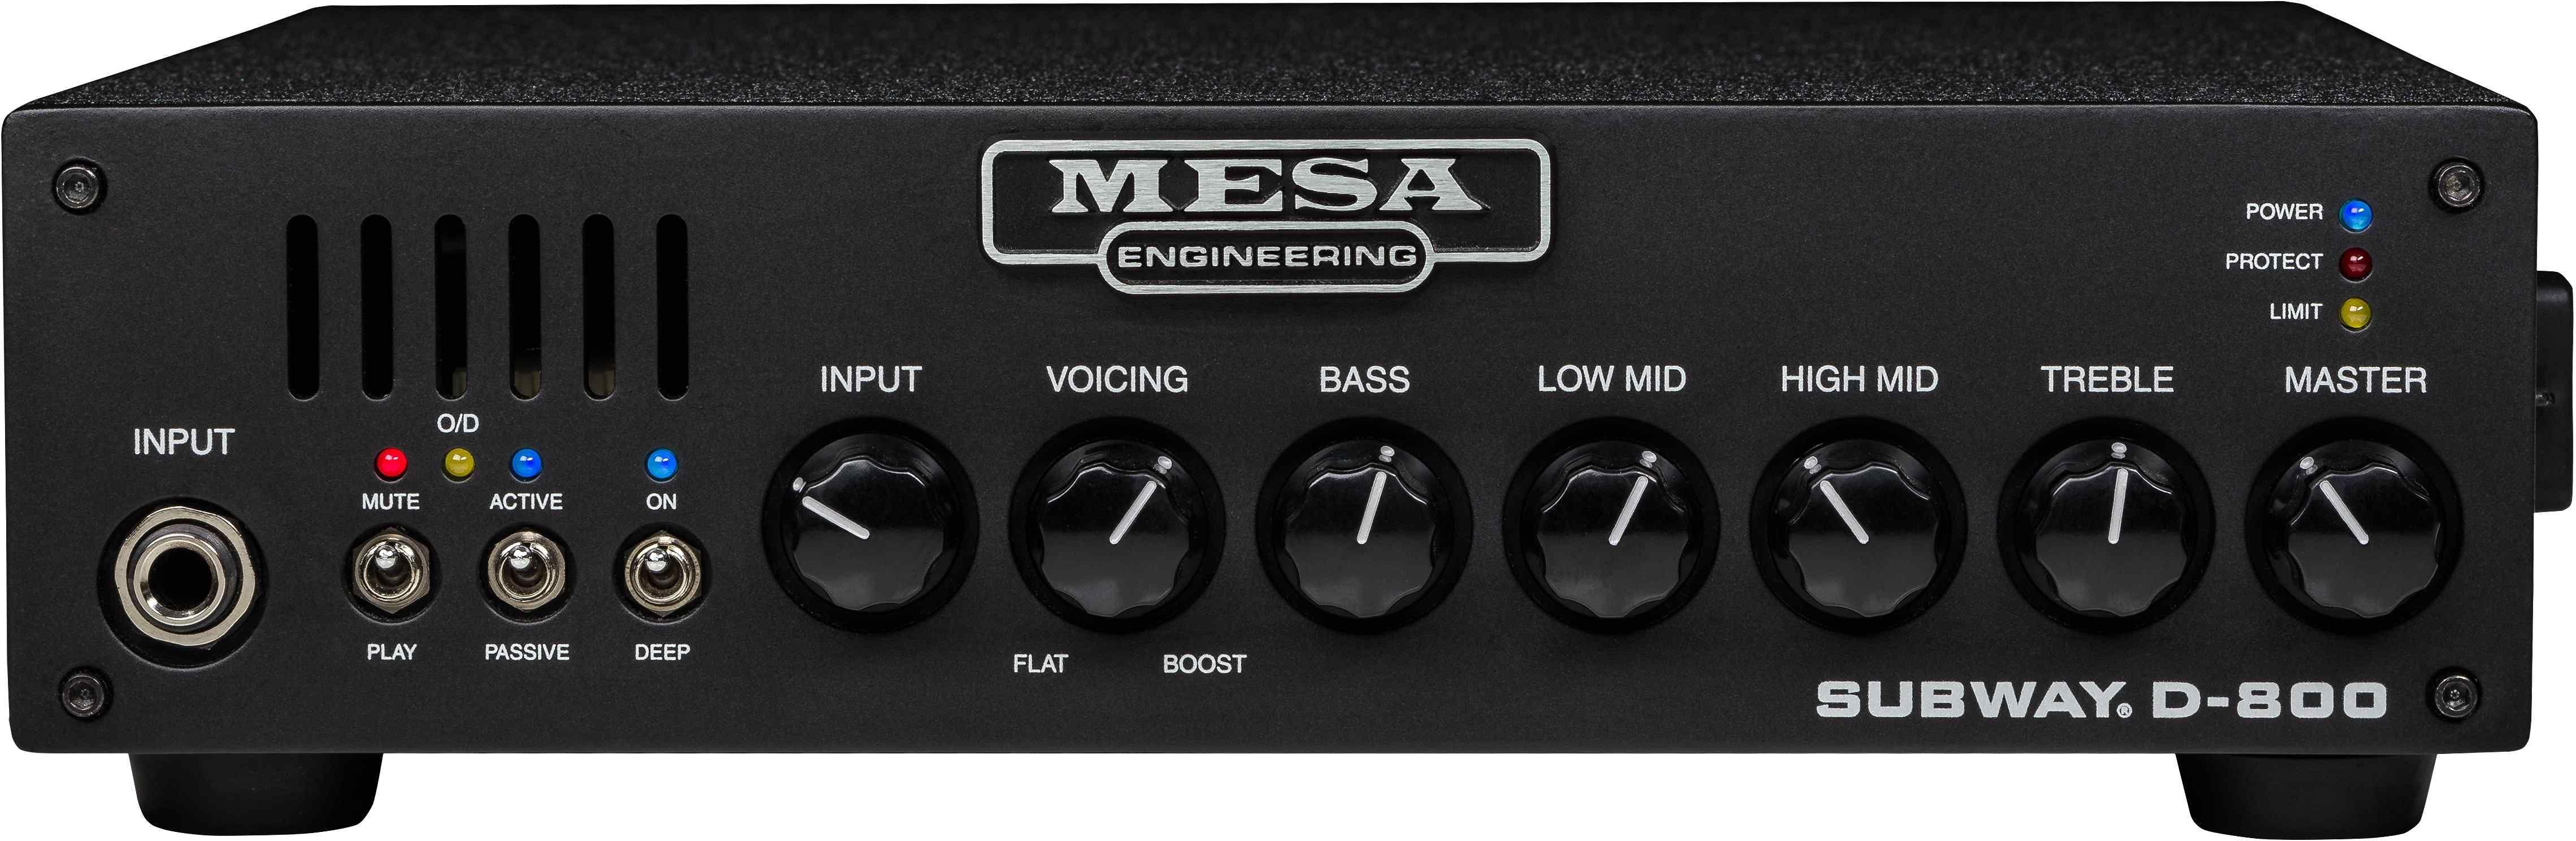 Mesa Boogie Subway D-800: Bass-Topteil (800W/2-4Ω, 400W/8Ω, 4-Band EQ, Deep Switch, Voicing Regler)